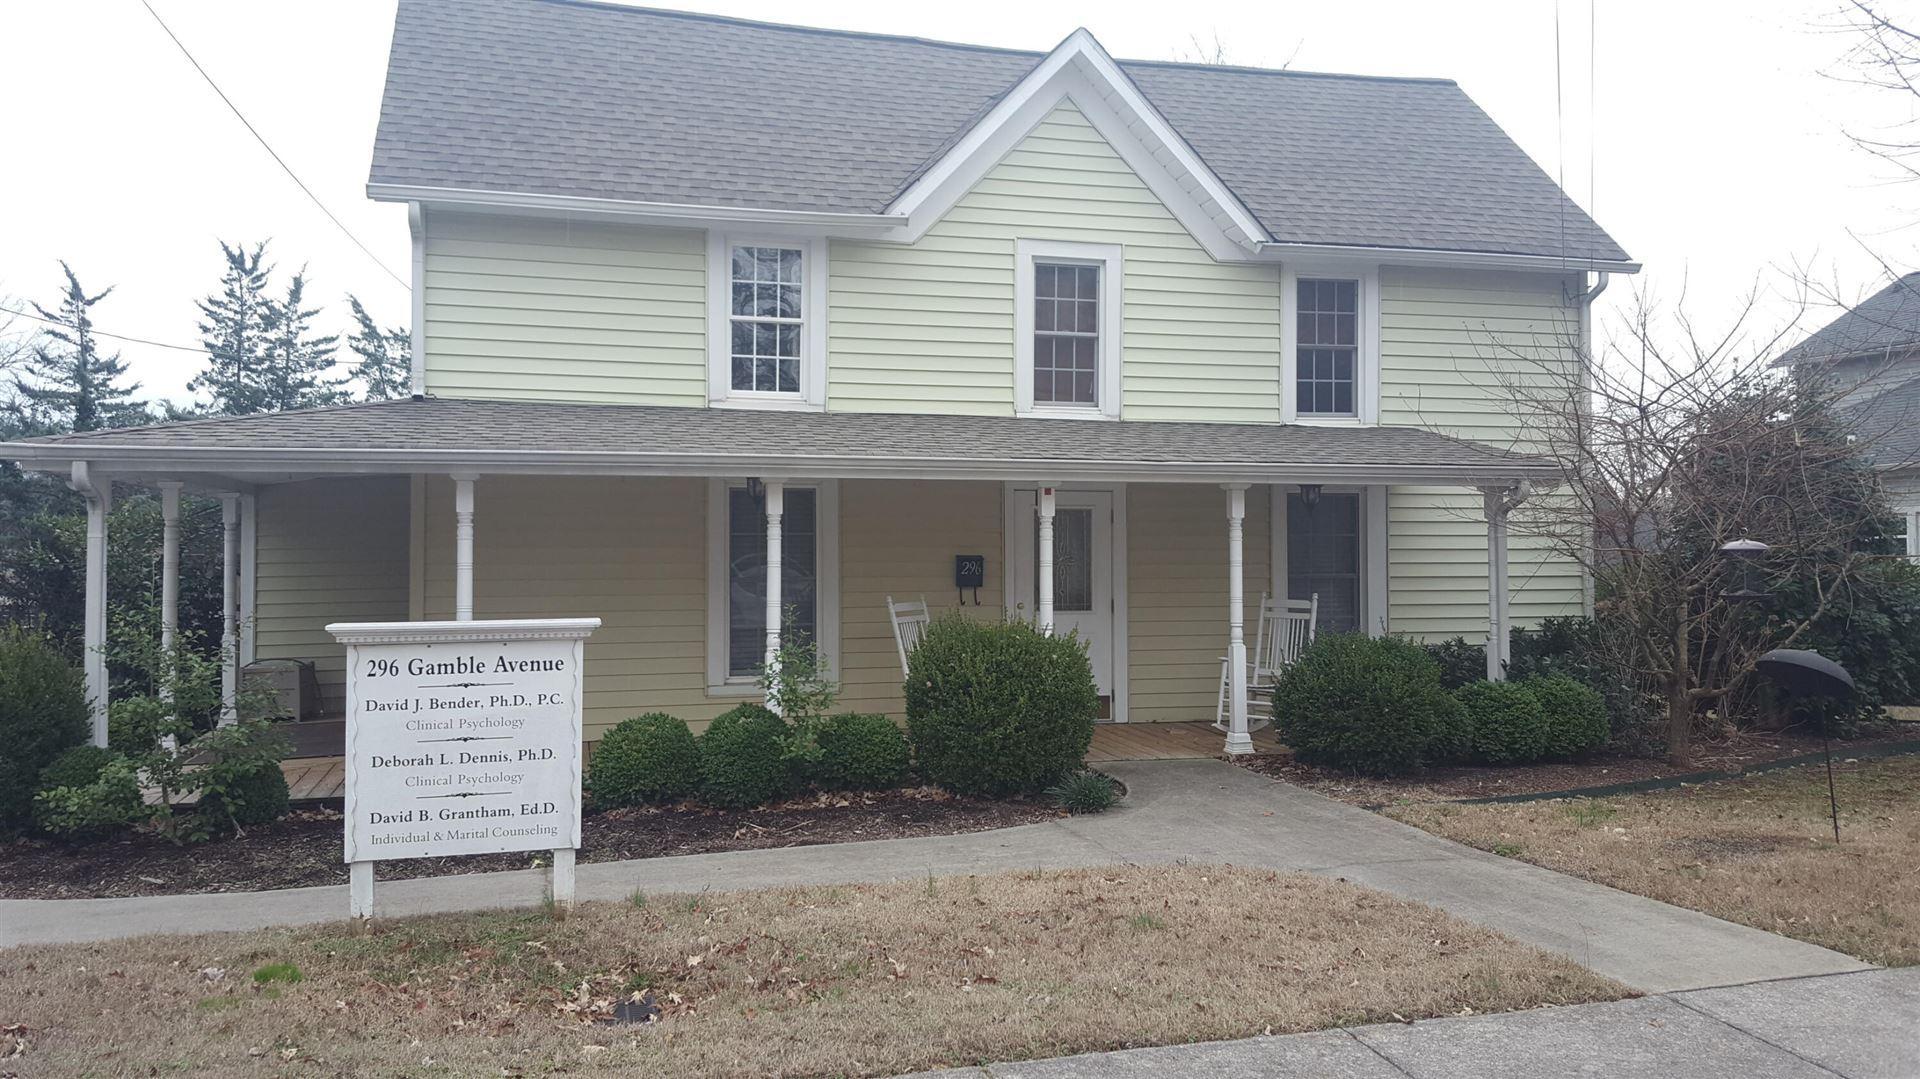 Photo of 296 Gamble Ave. Ave, Maryville, TN 37801 (MLS # 1166747)